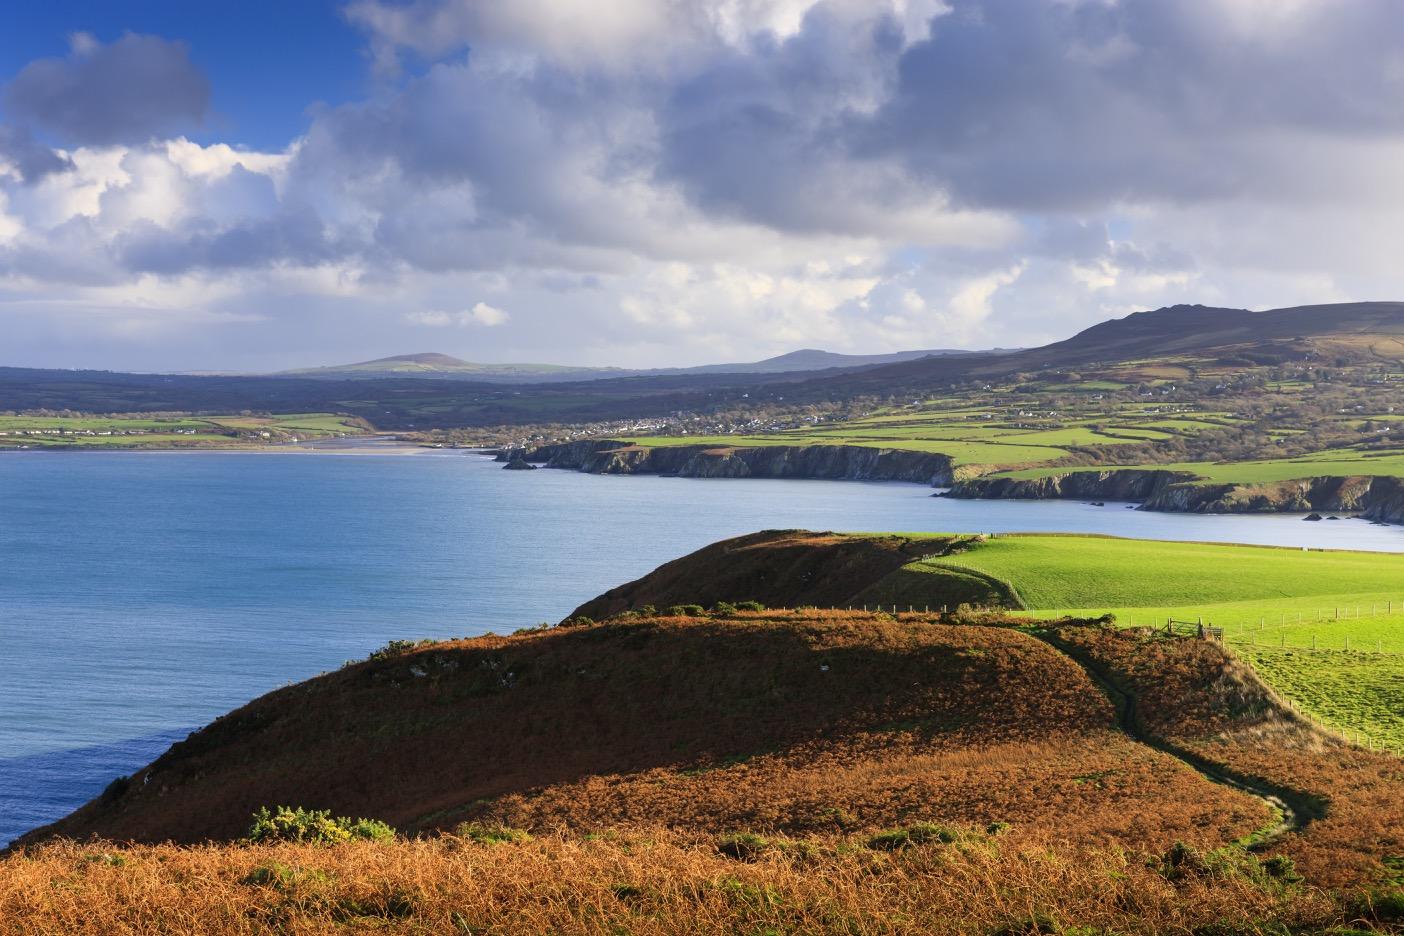 View from Dinas Head towards Newport